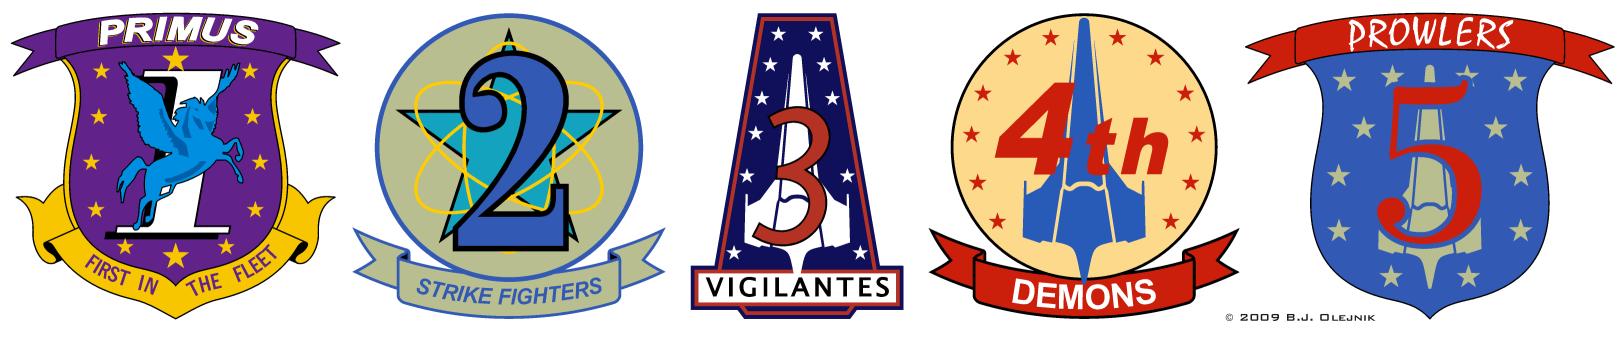 Logos 2 by BJ-O23